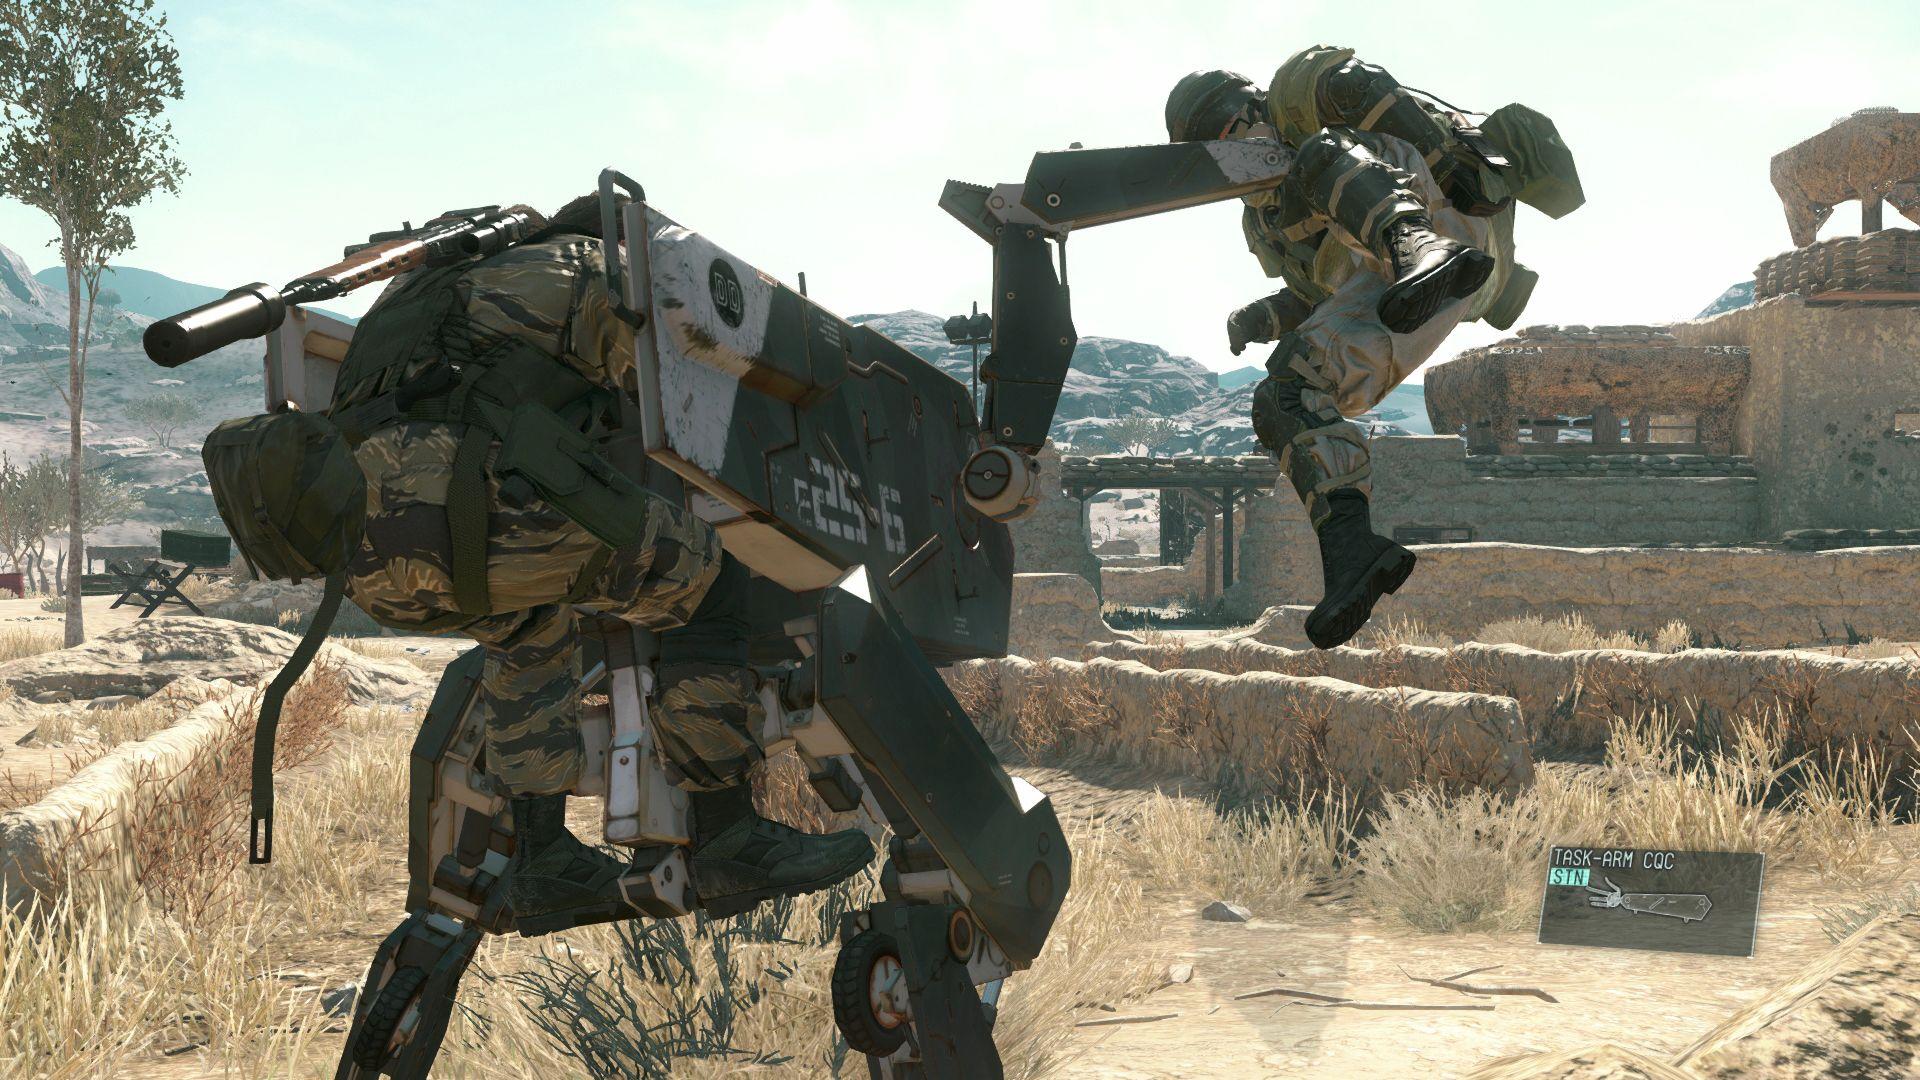 Spousta nových HD obrázků z Metal Gear Solid V: The Phantom Pain 110536